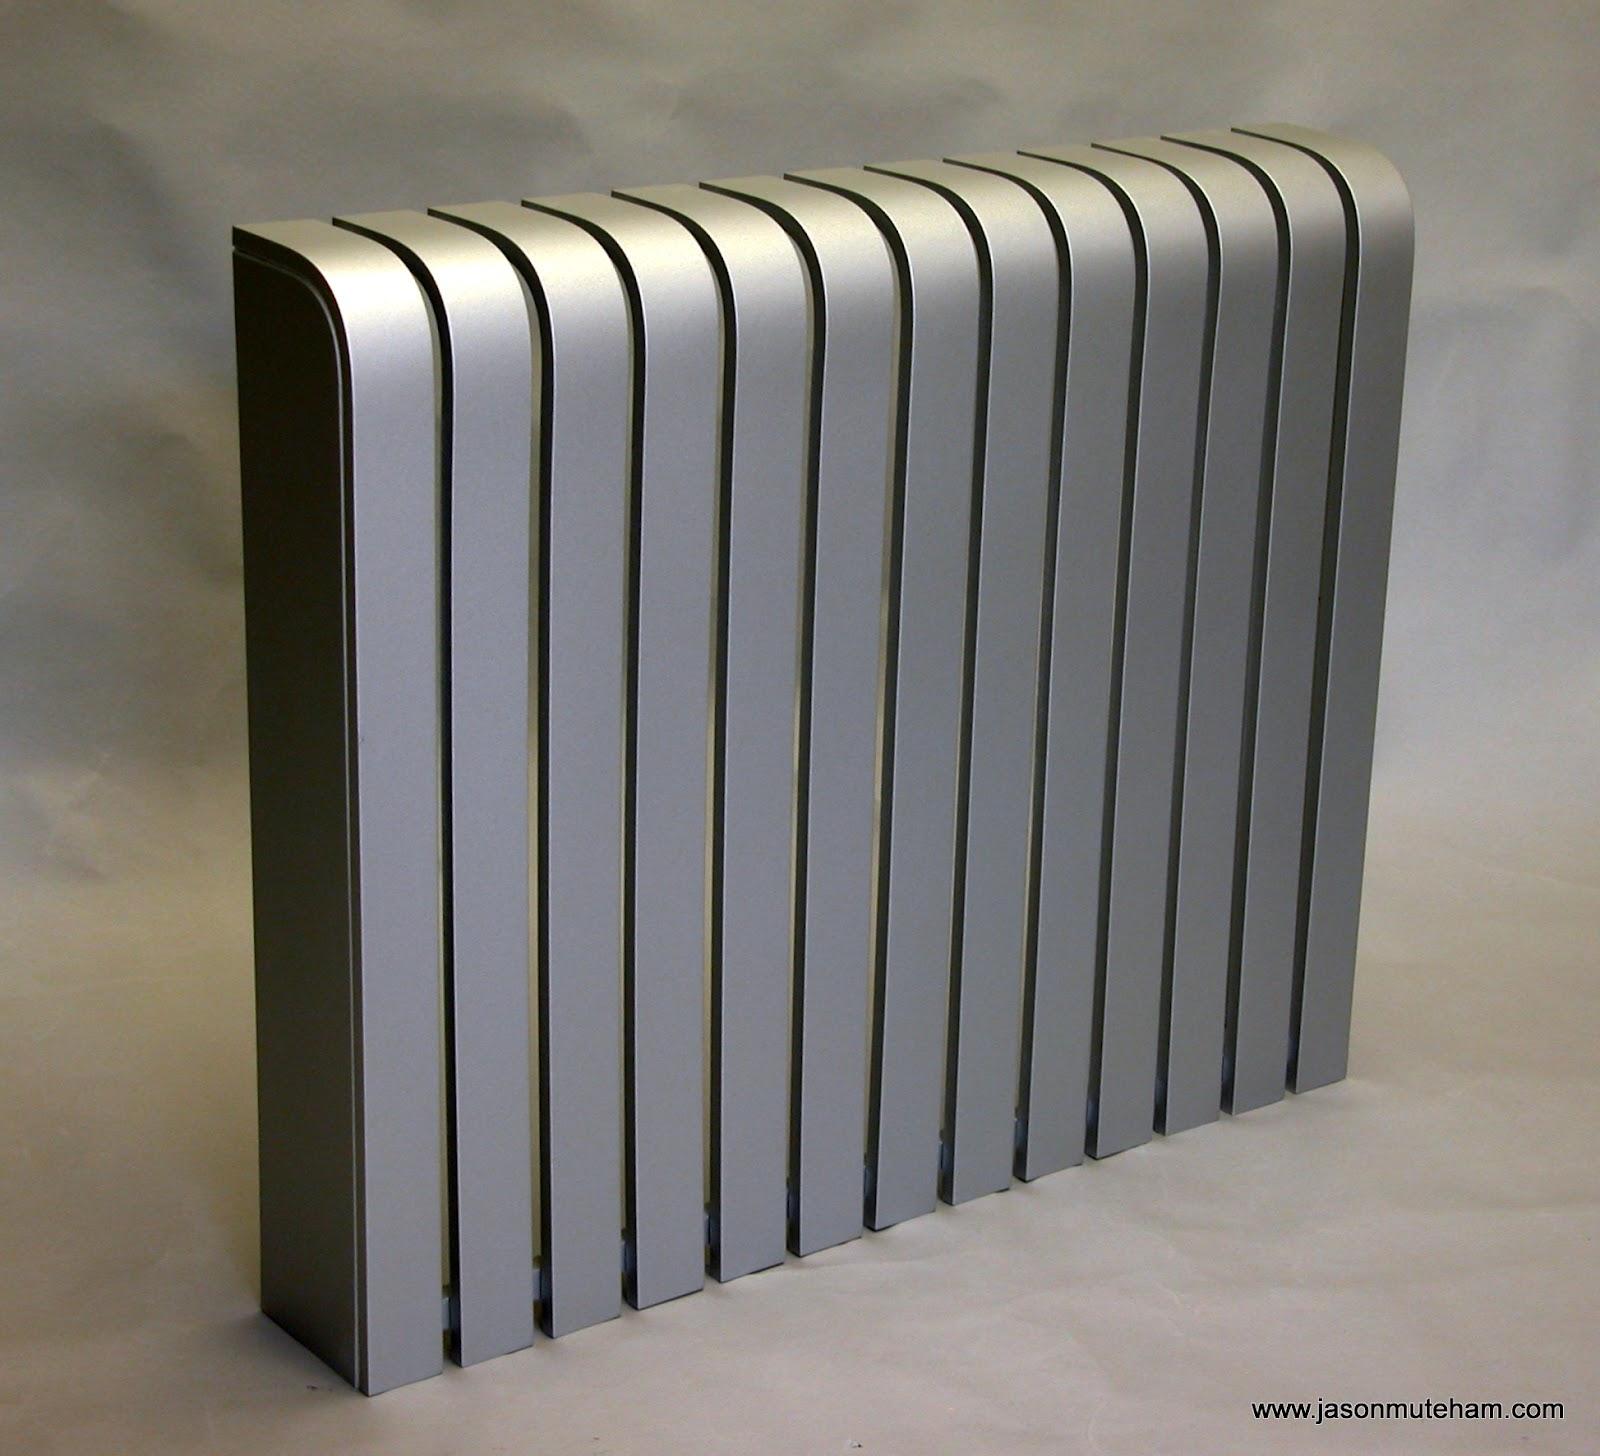 Jason Muteham Furniture Designer Amp Maker Painted Covers